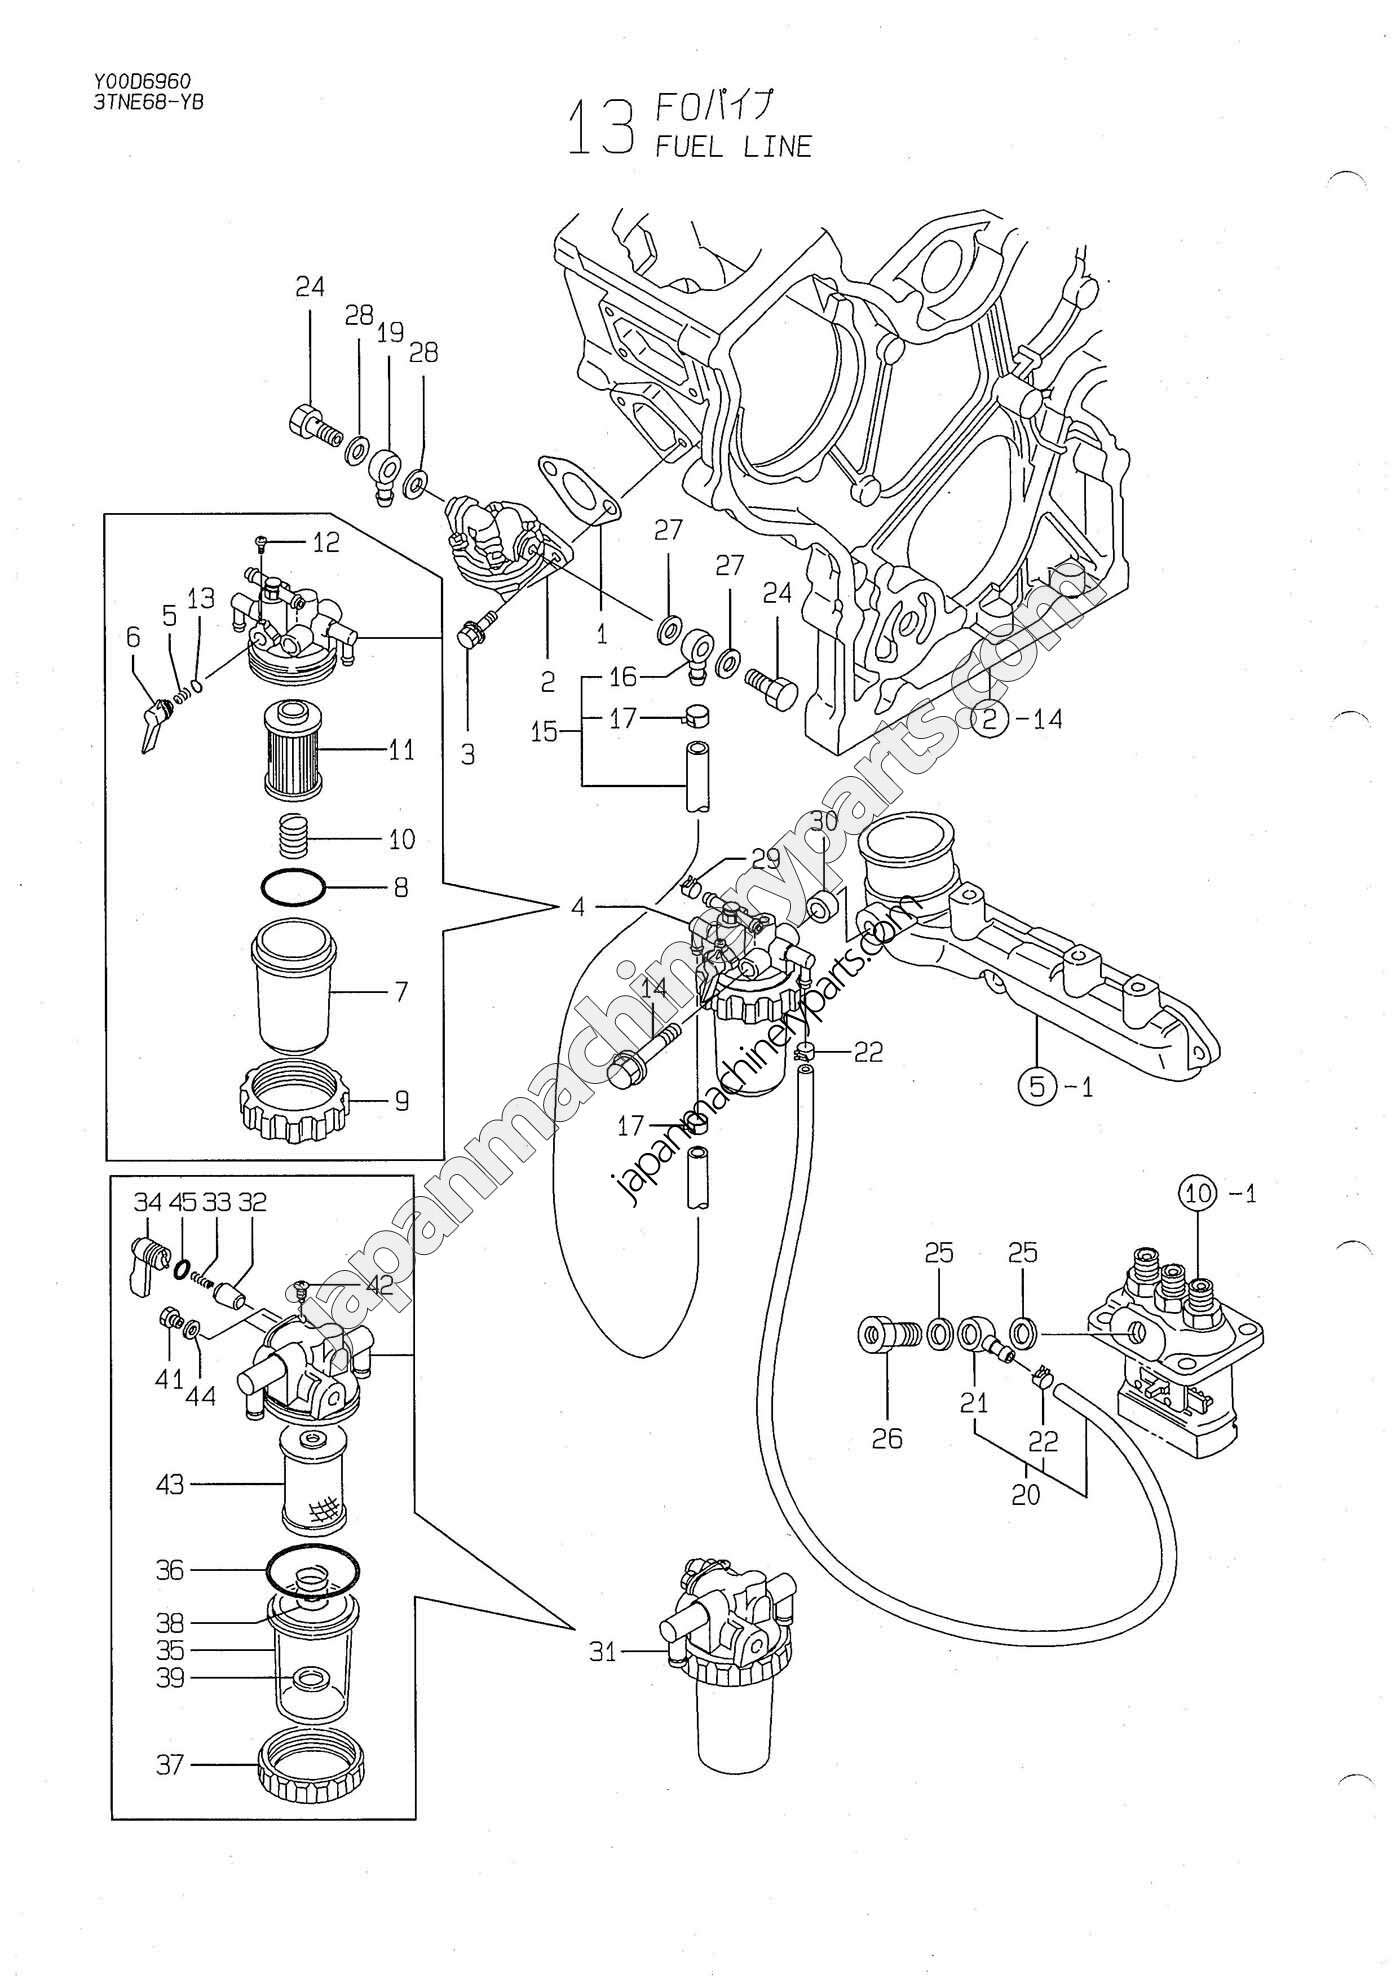 4tne98 Parts Manual